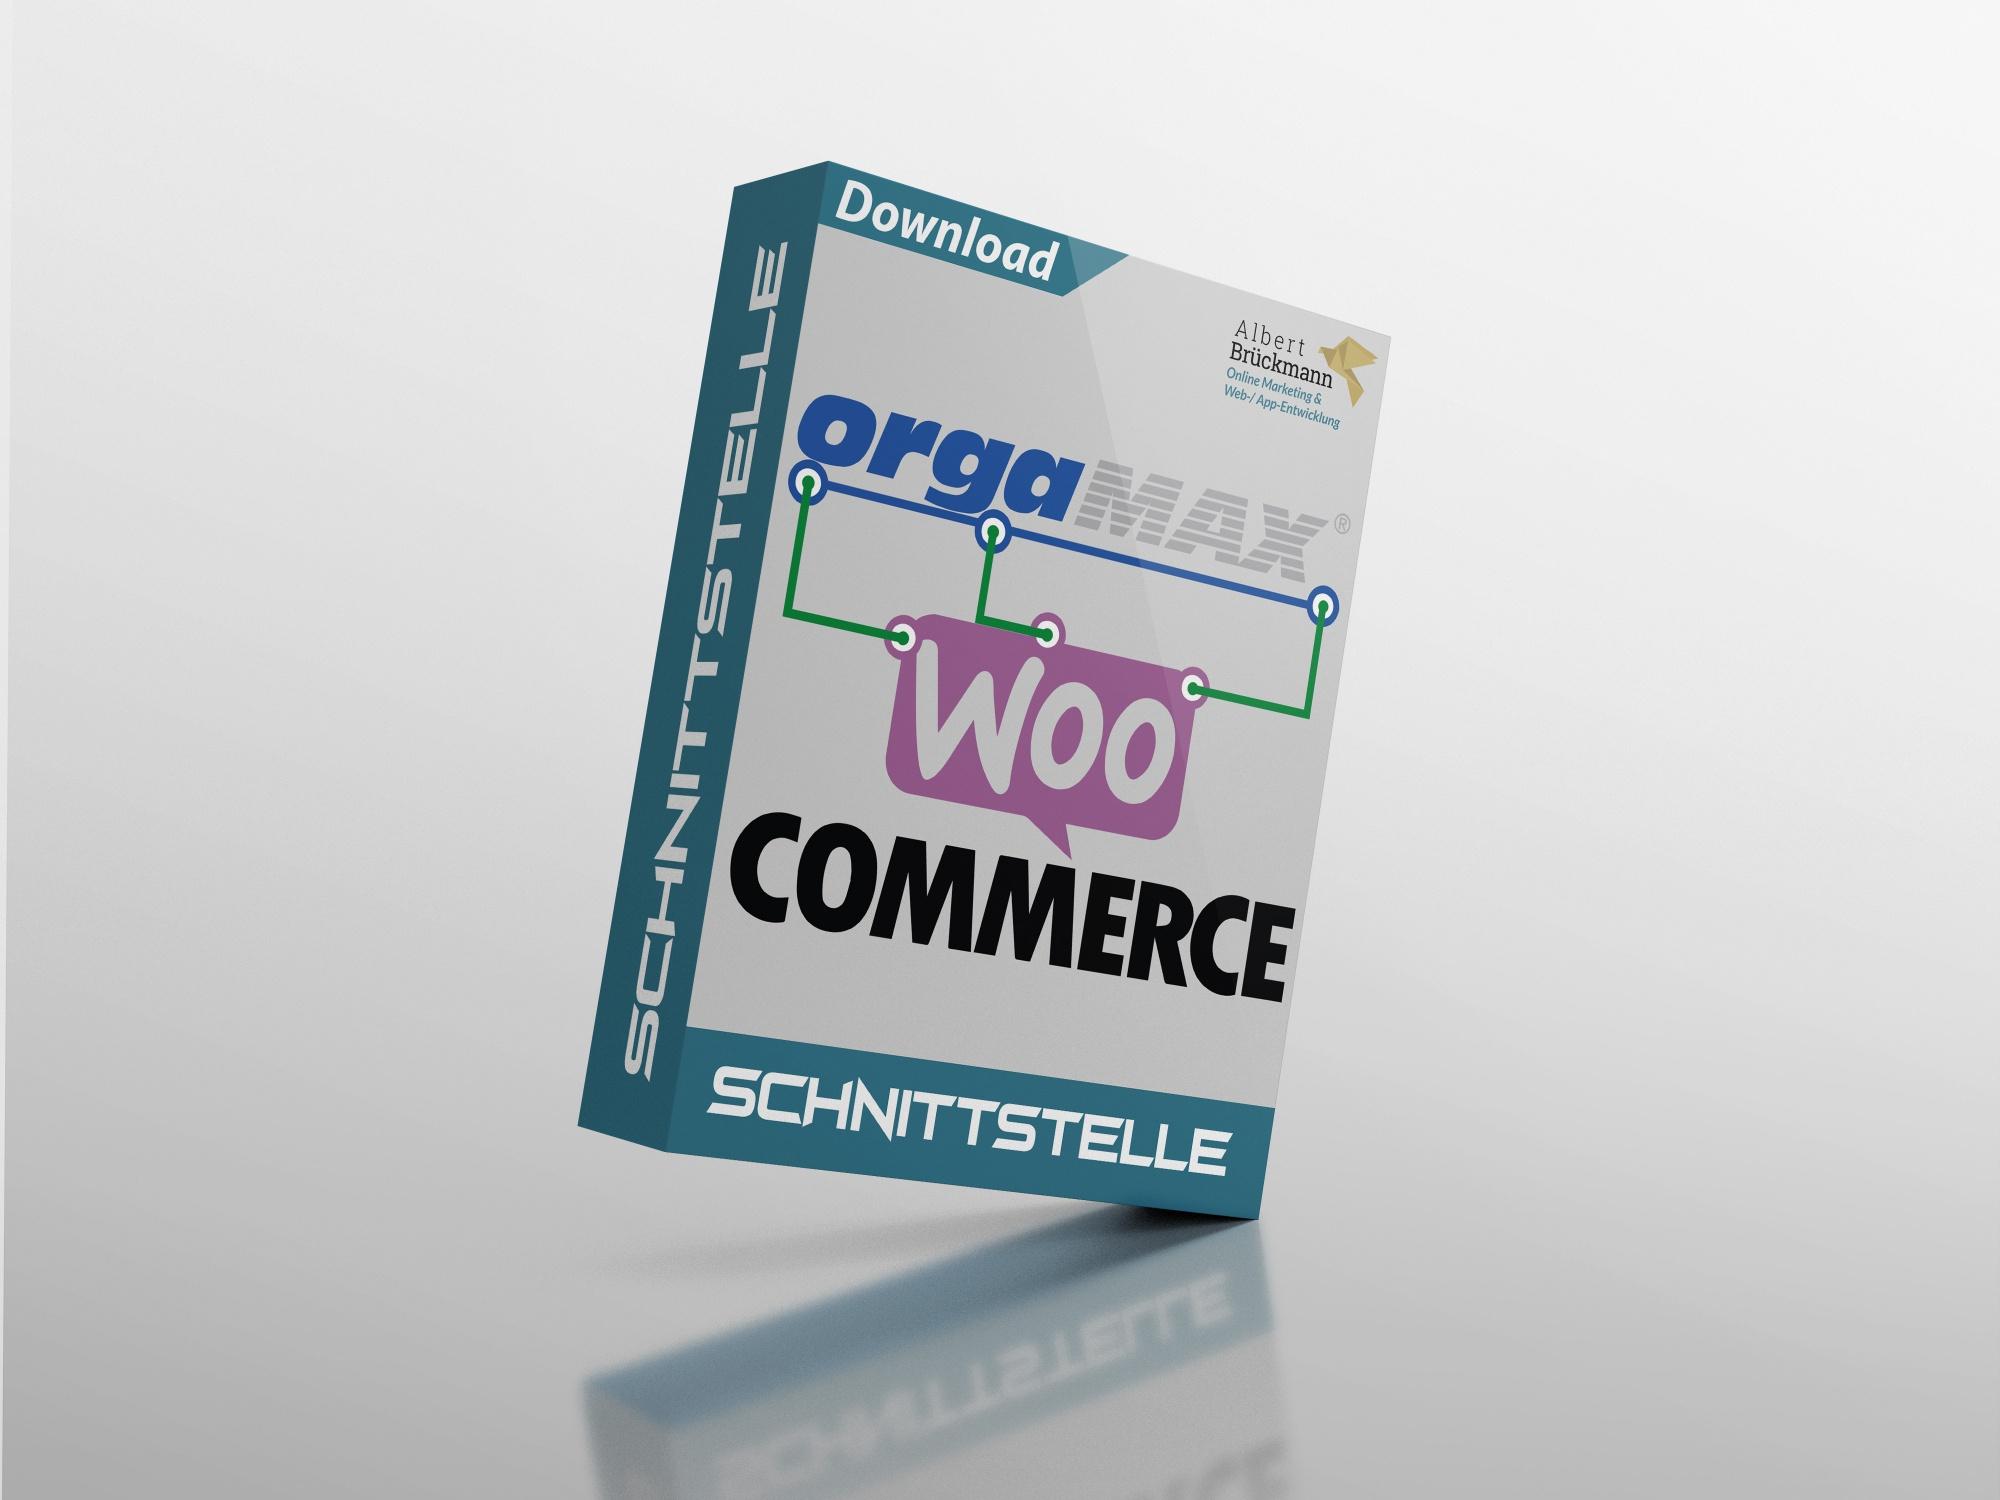 WooCommerce orgaMAX Schnittstelle